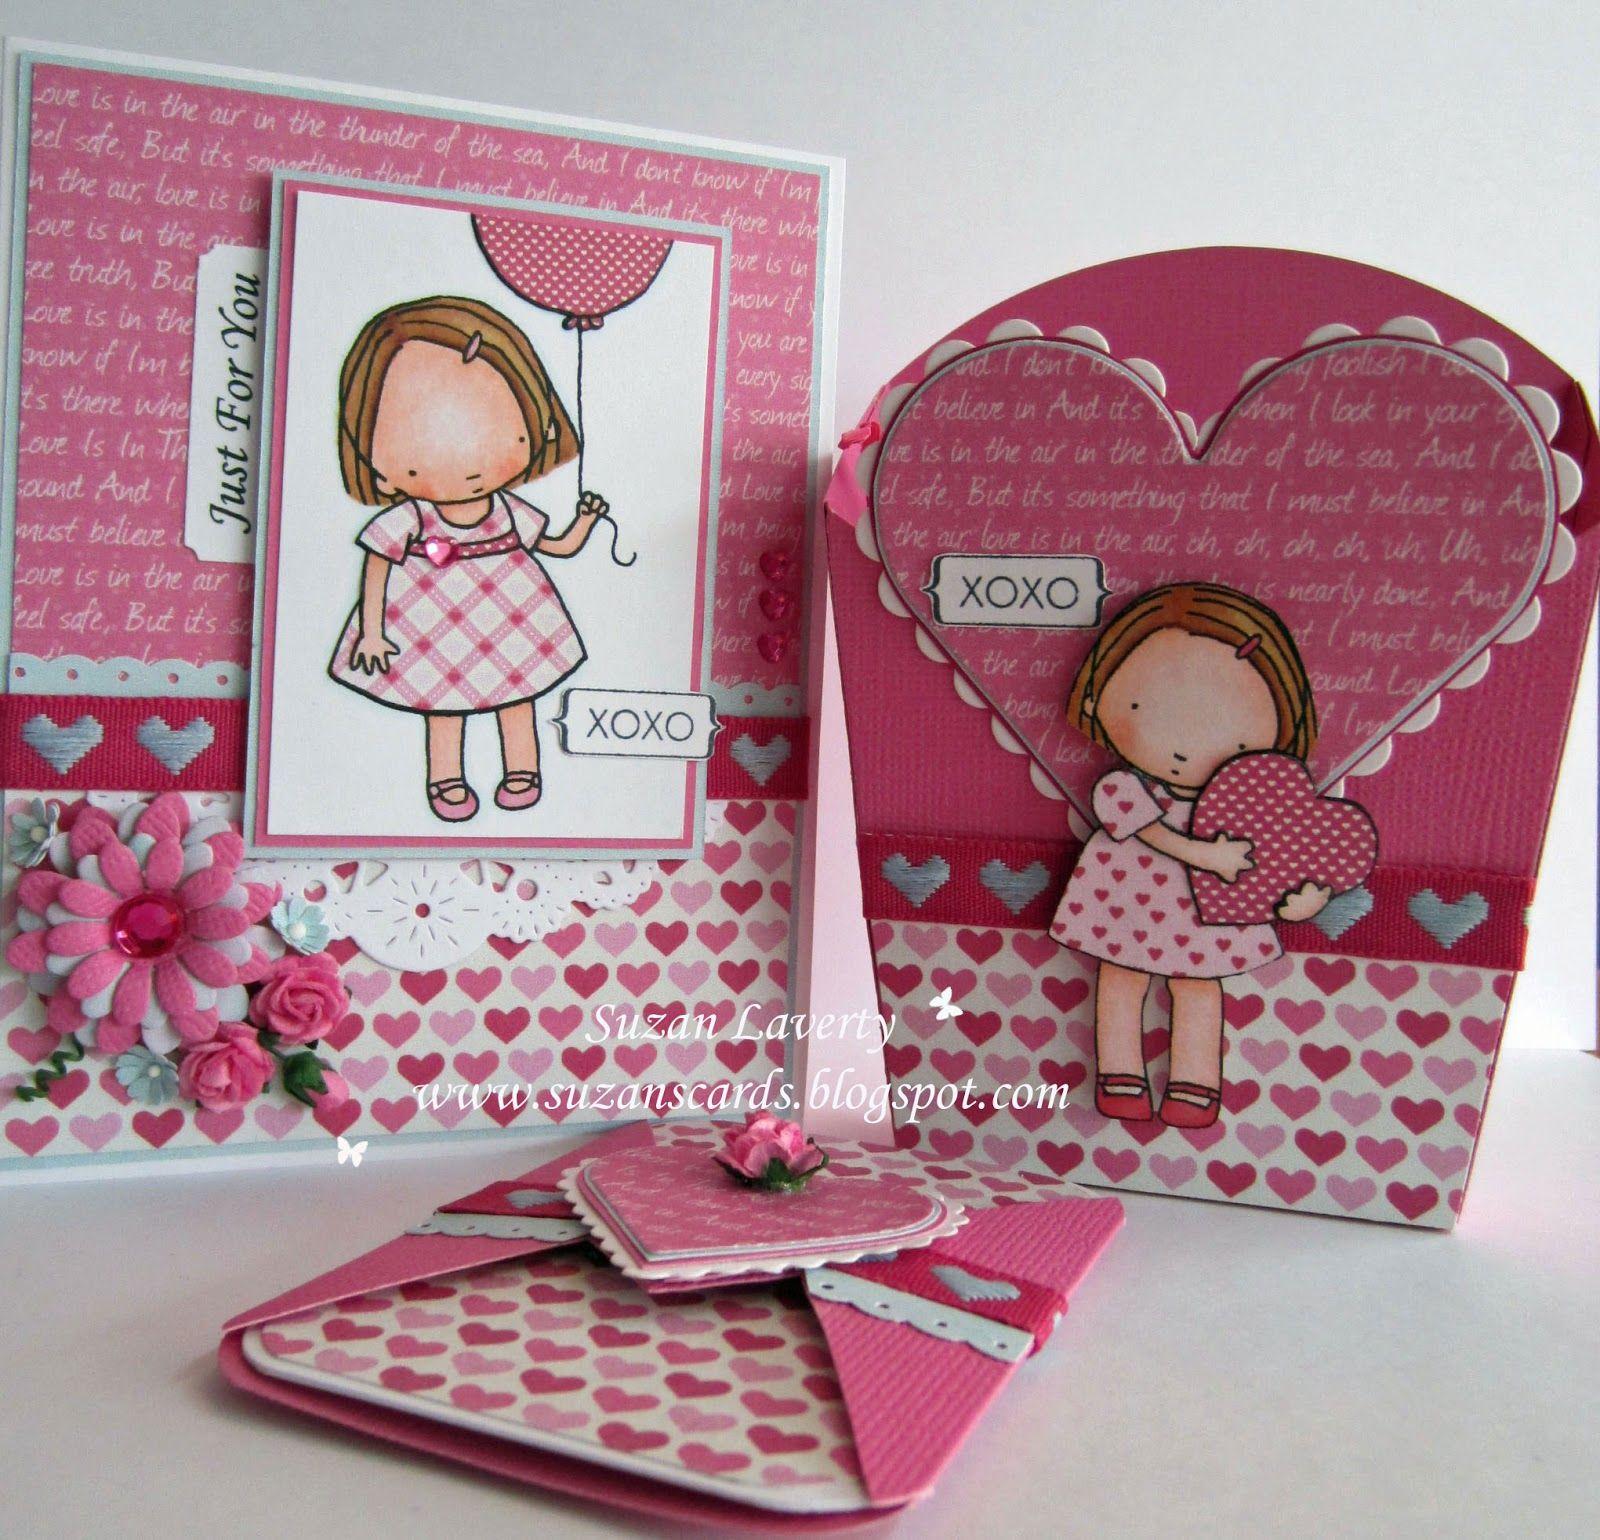 Pin de Cute As A Button Desgns en Card making Ideas | Pinterest